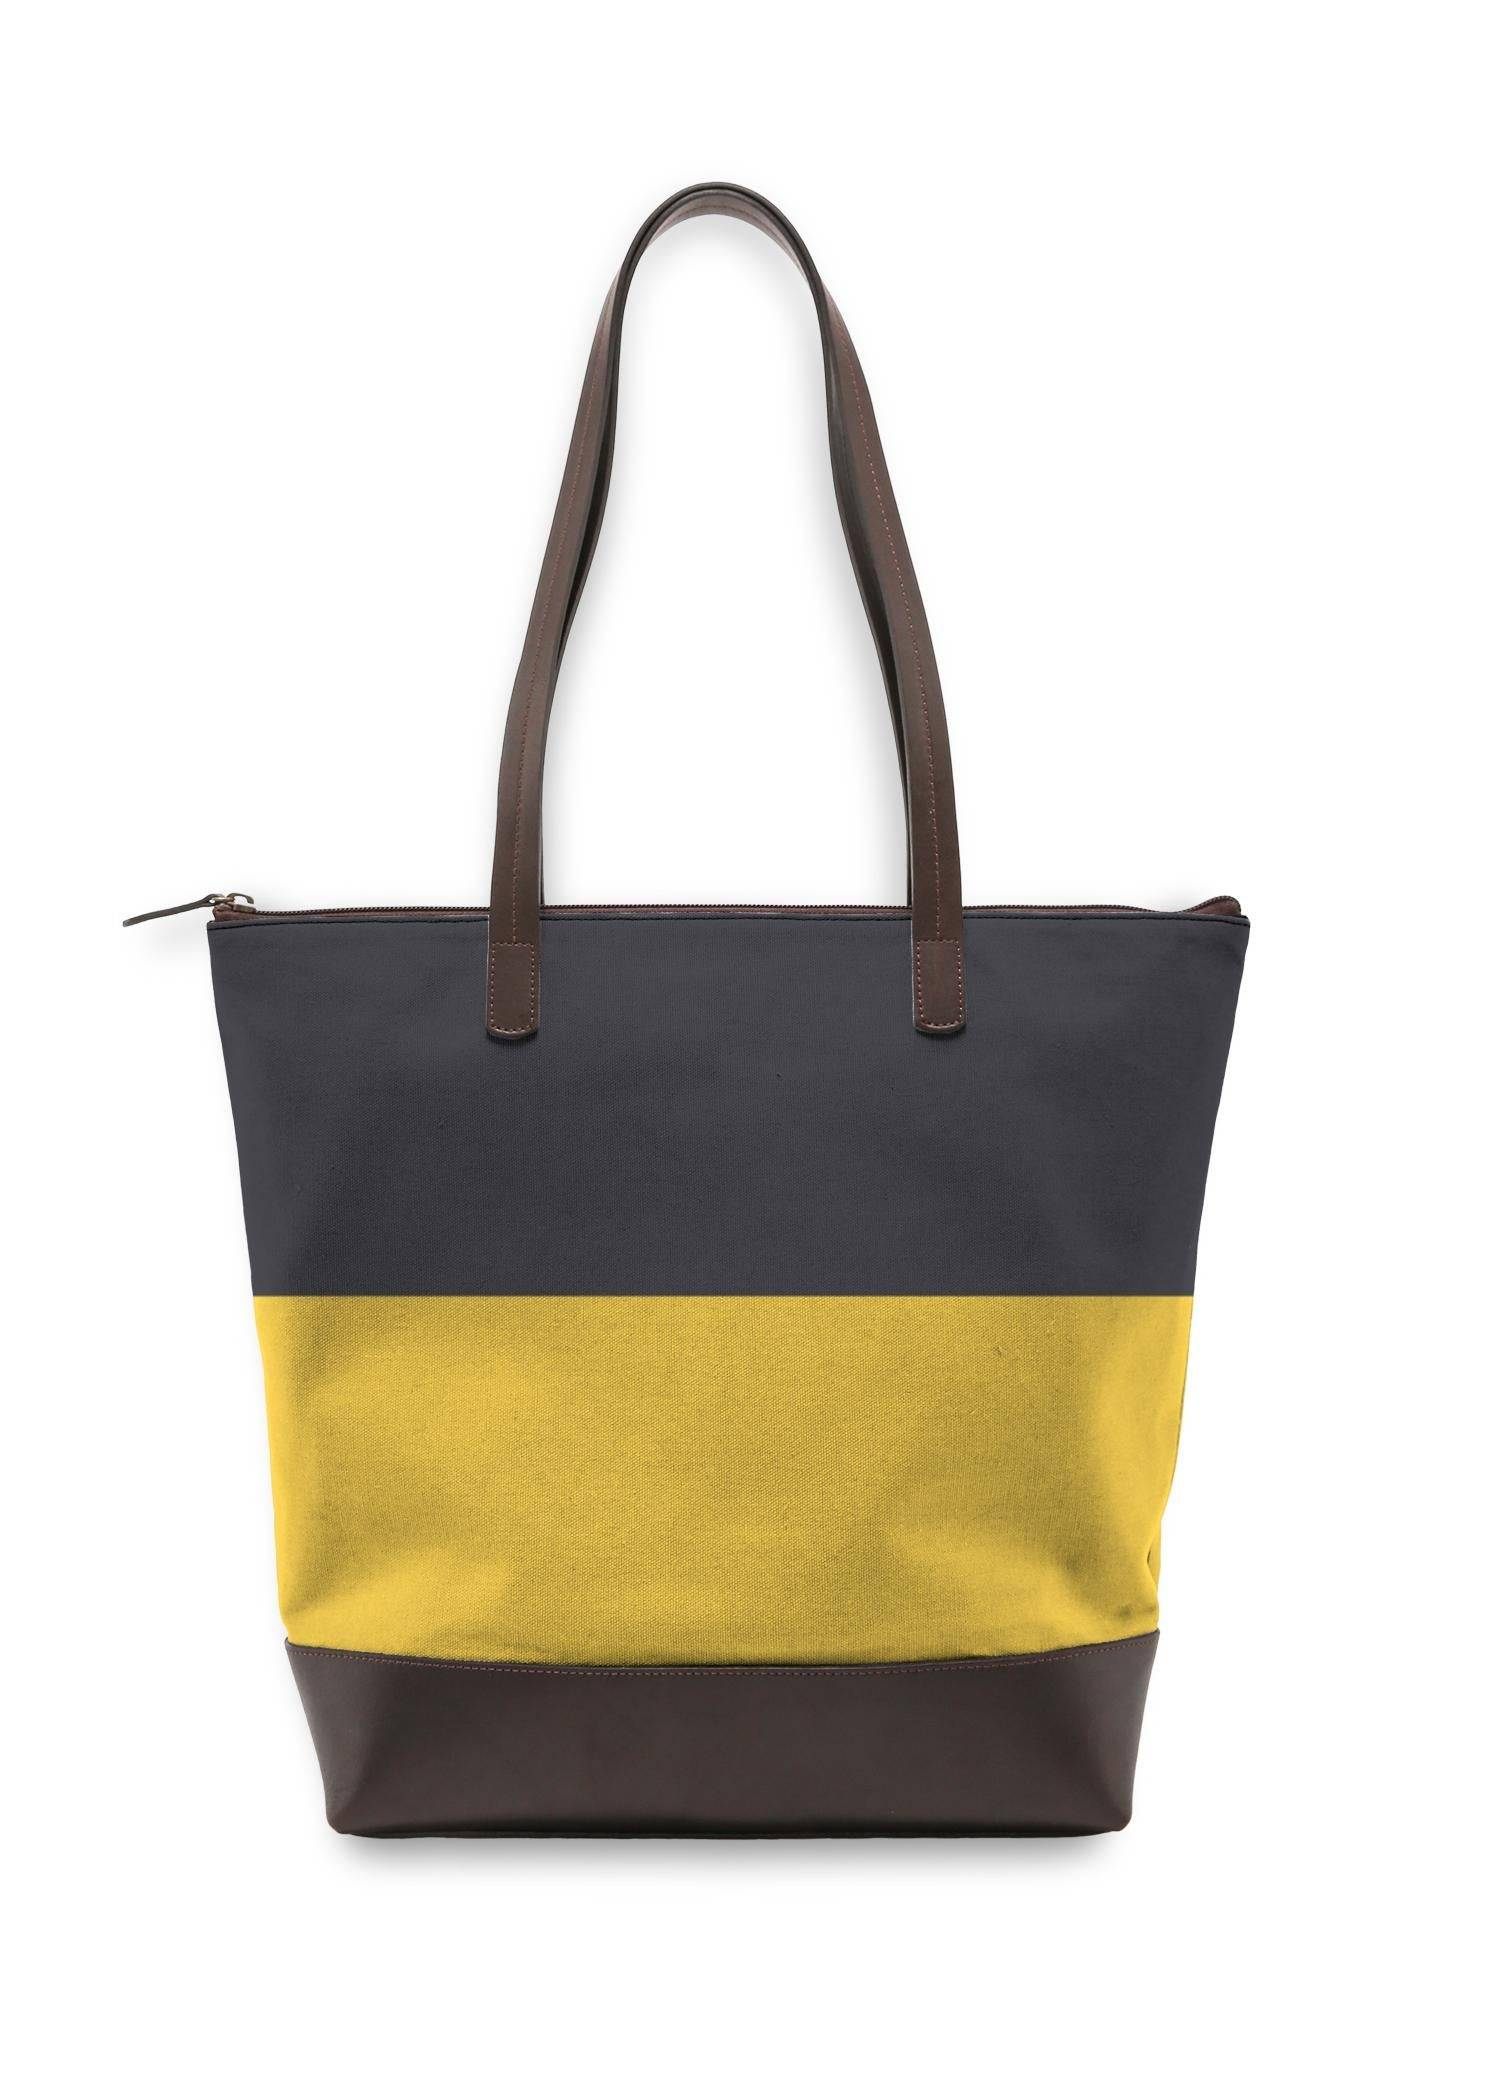 VIDA Statement Bag - Blue Yellow Fashion by VIDA Original Artist  - Size: One Size